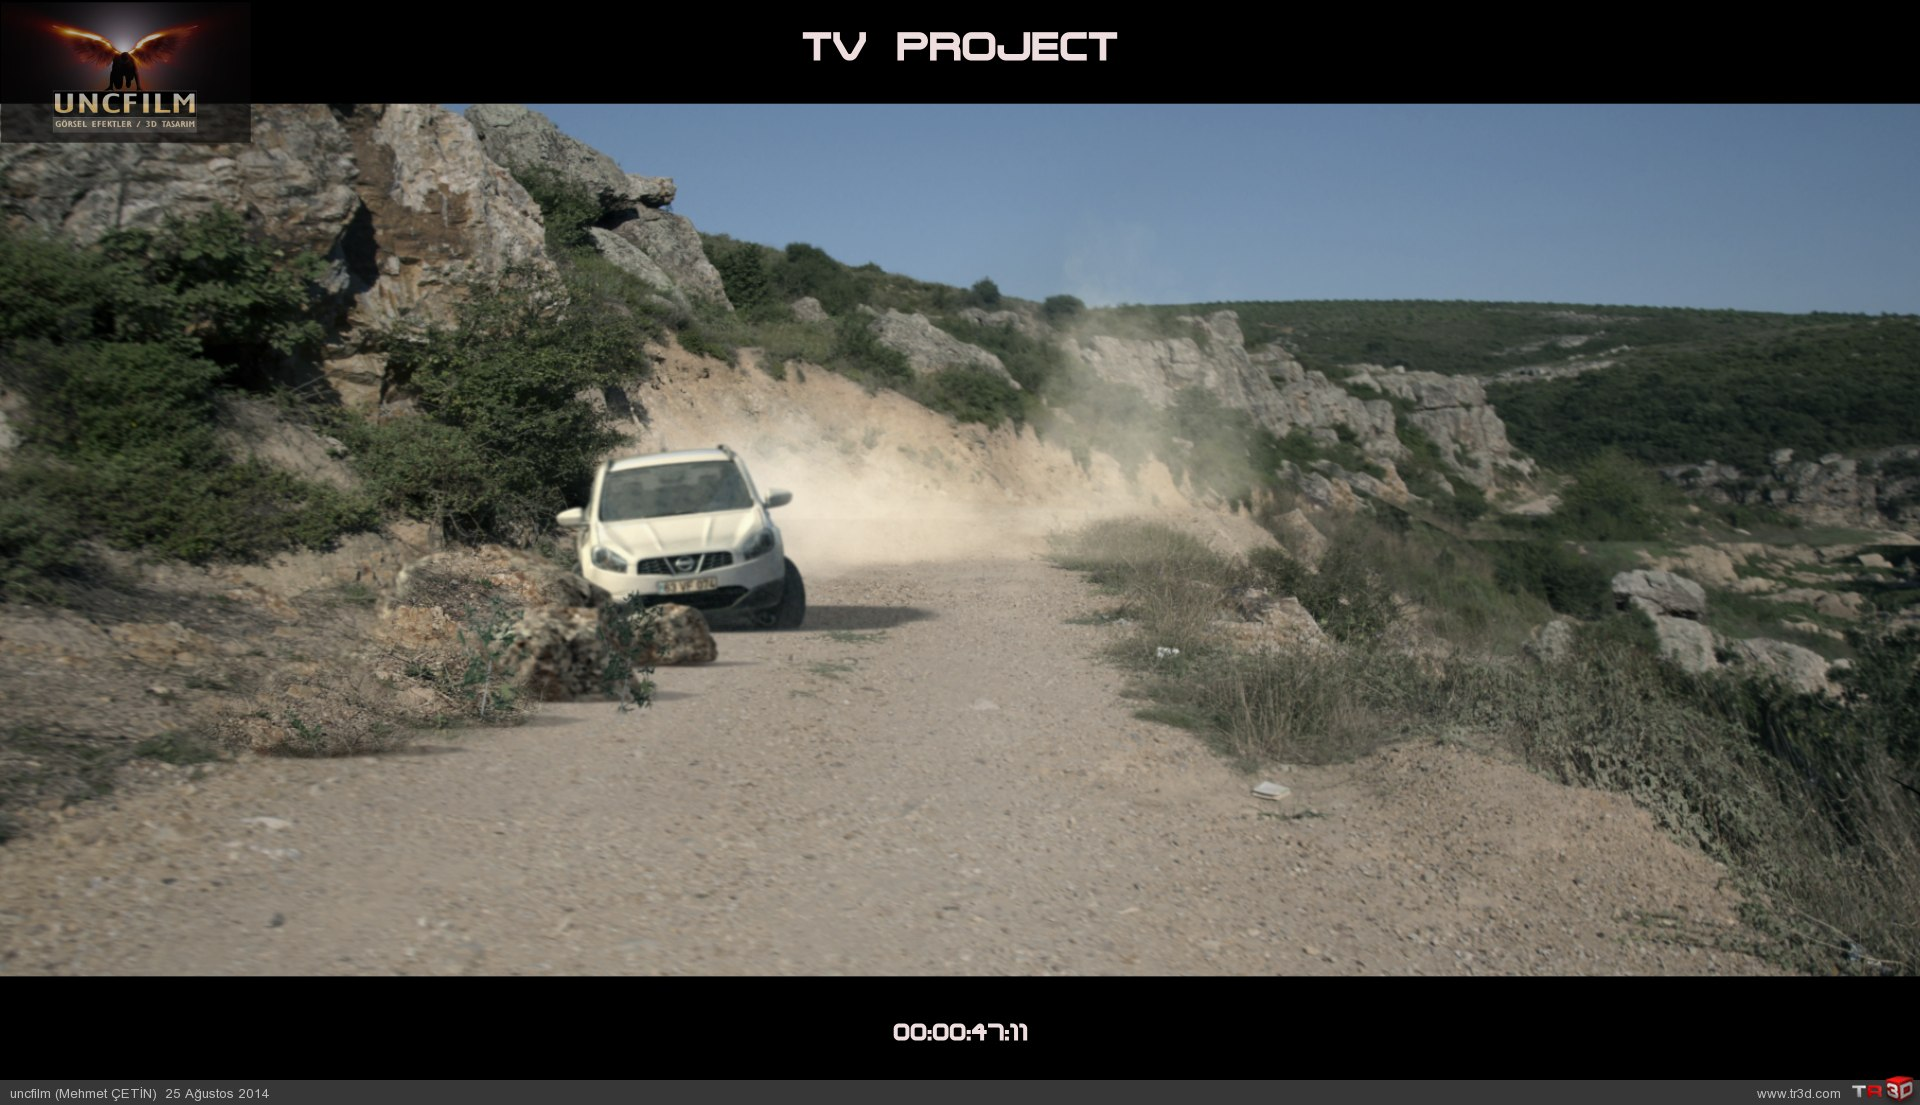 Tv produksiyon, kaza sahnesi 1